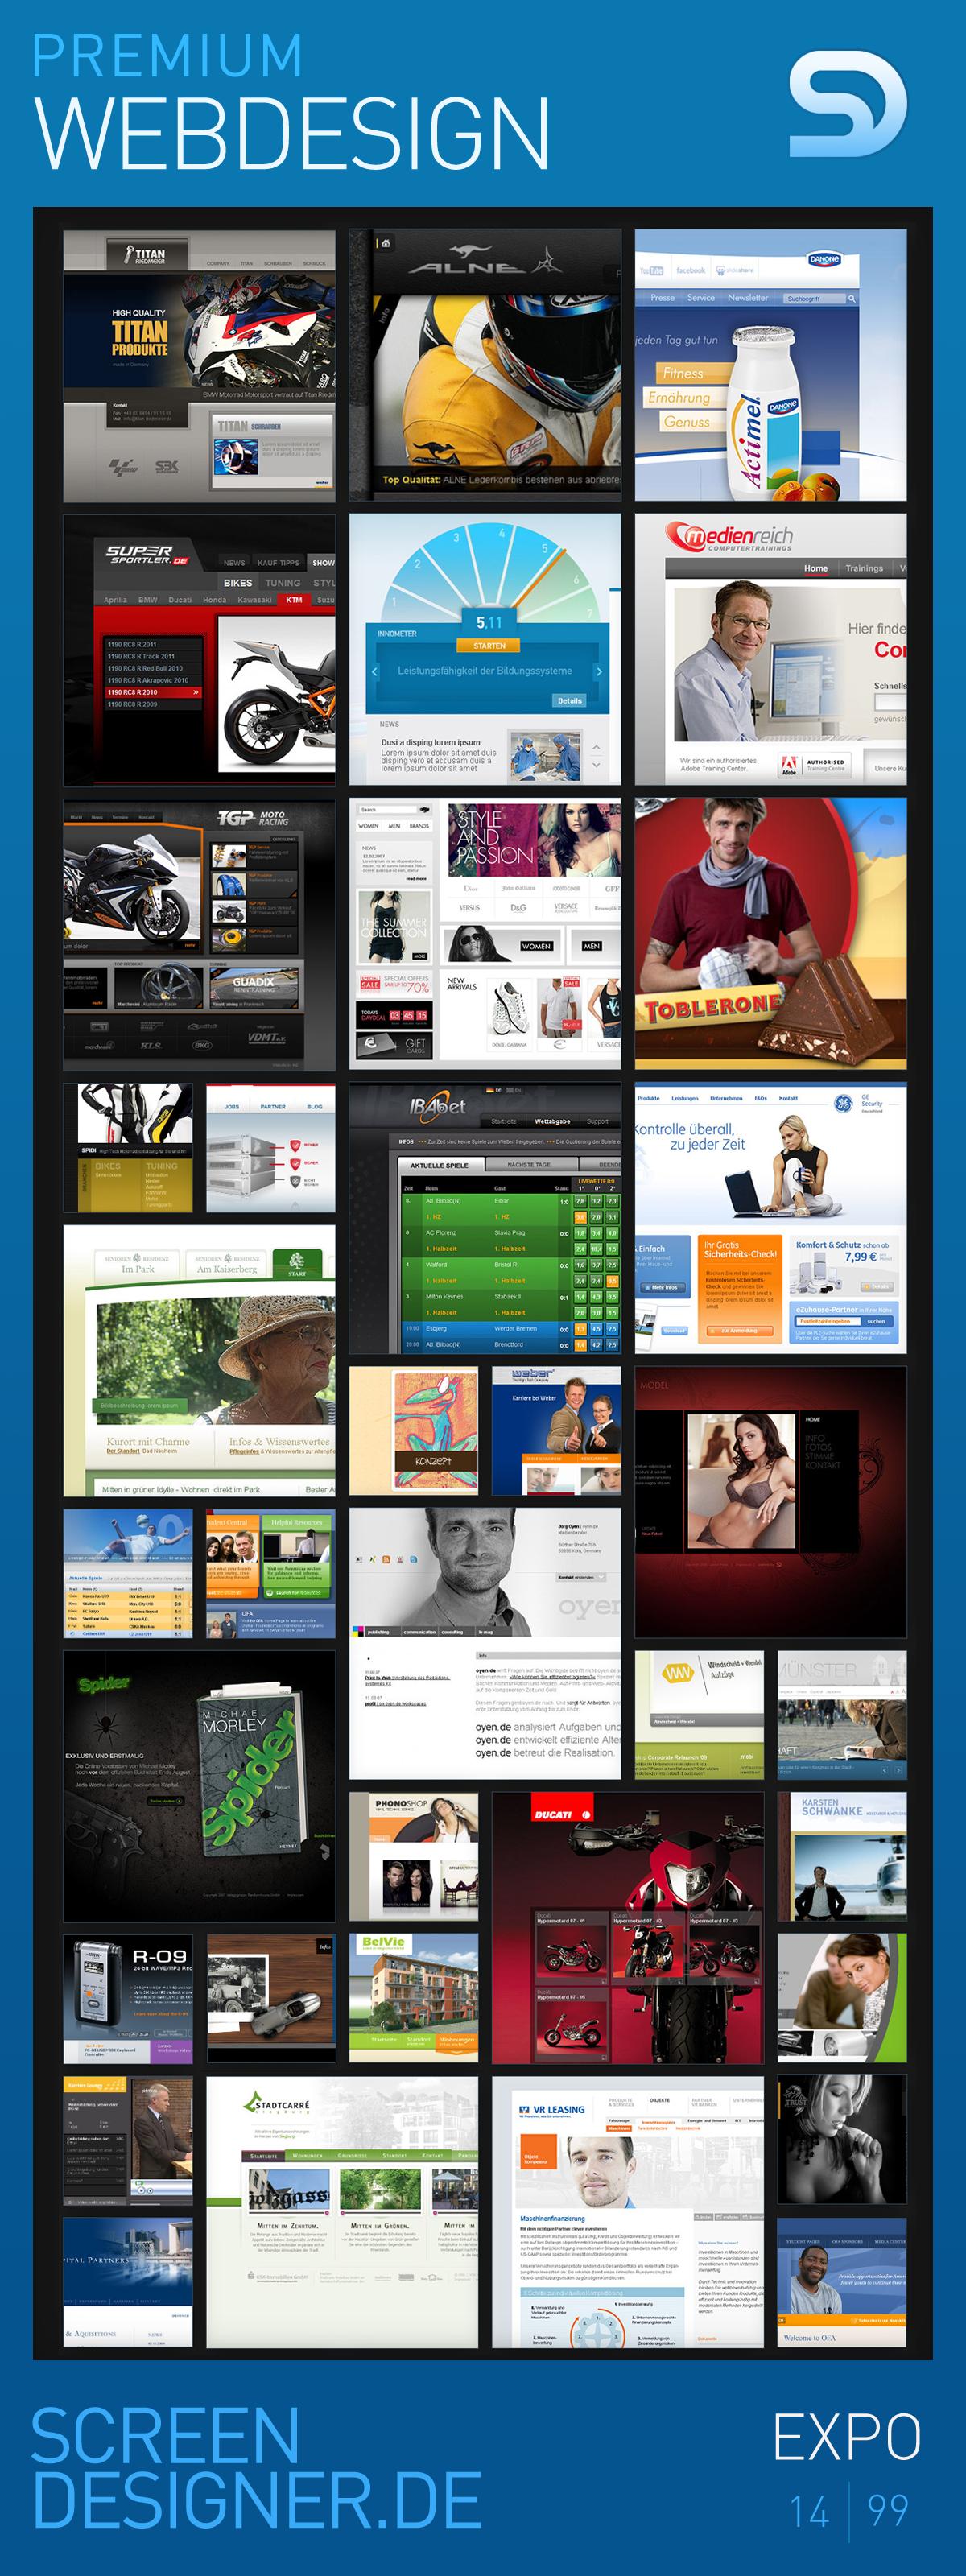 Premium Webdesign Projekte aus der www.screendesigner.de/expo